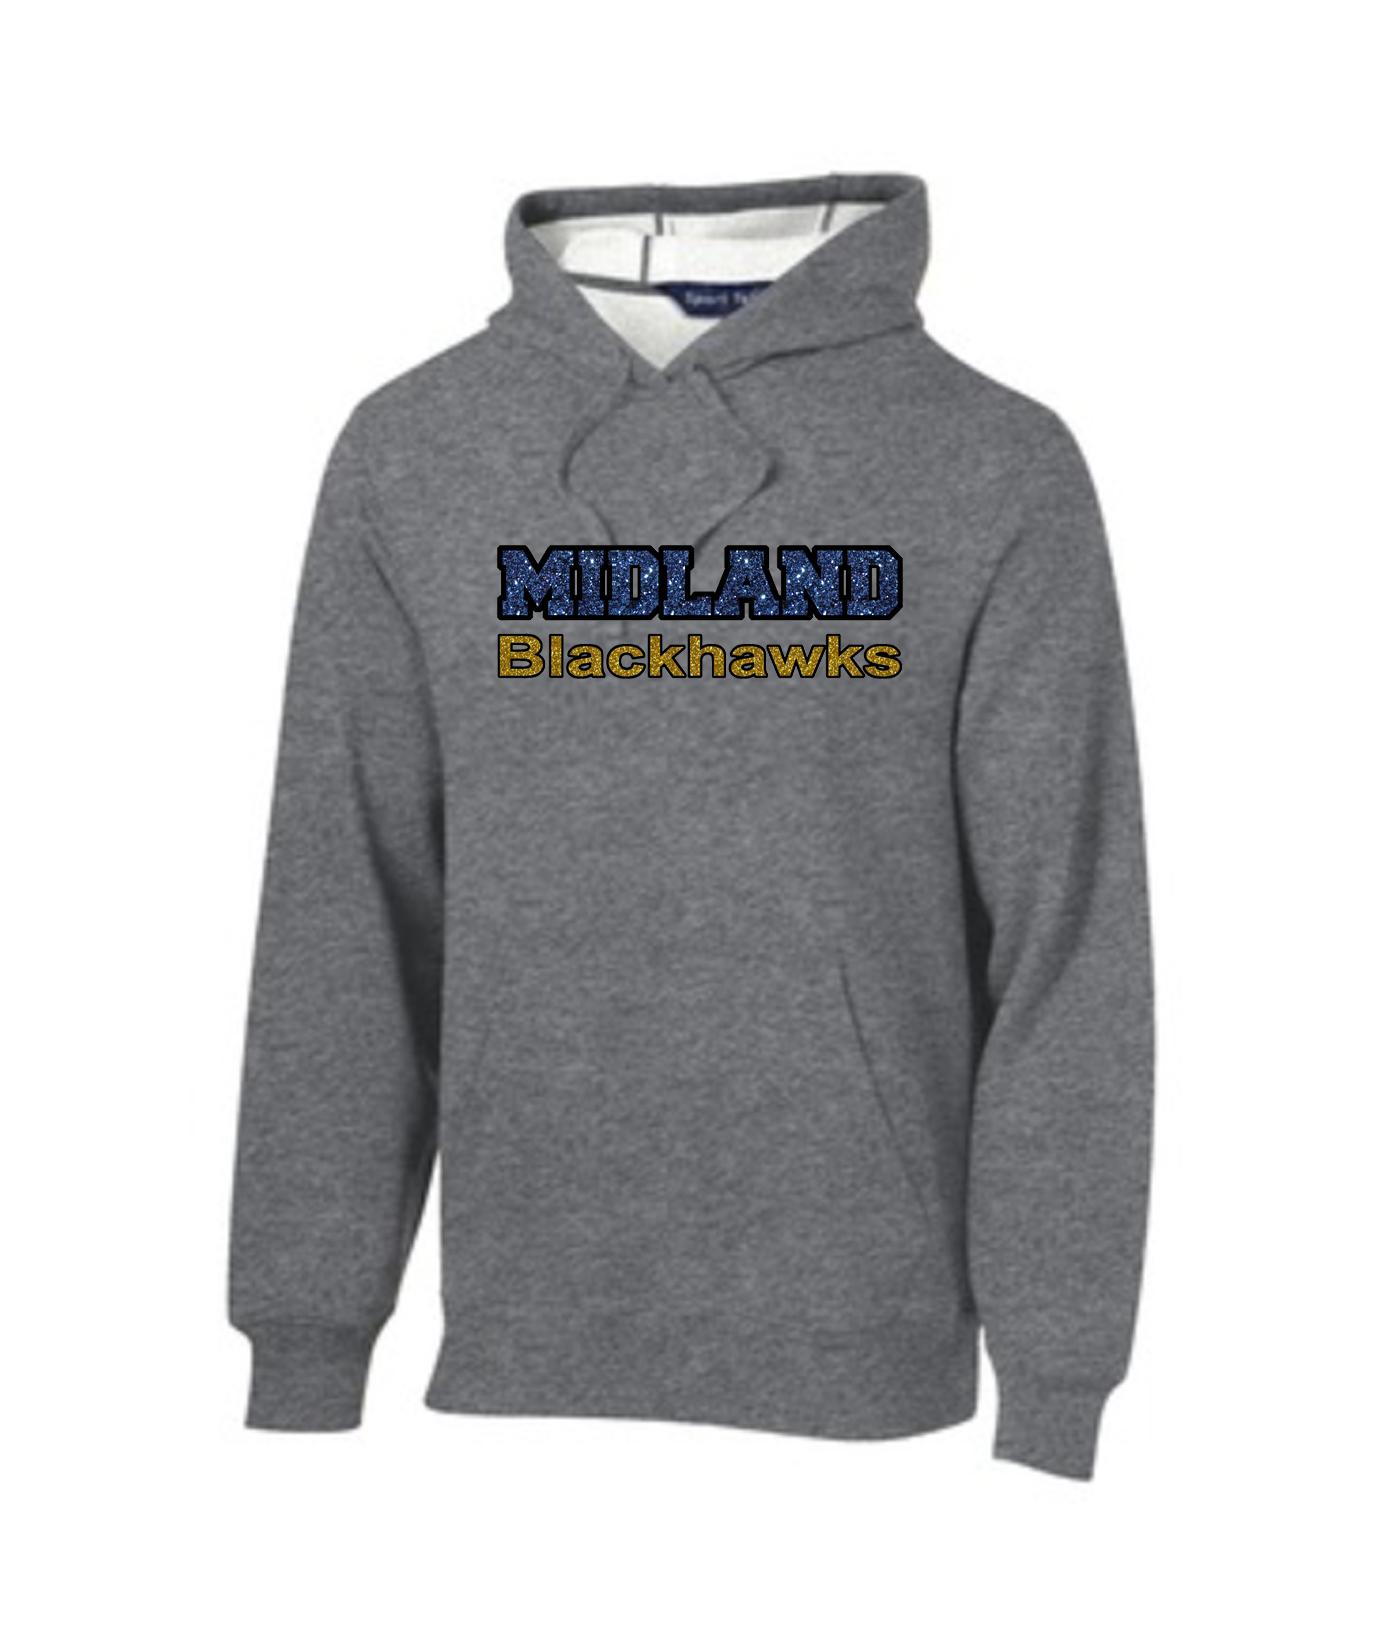 Sport-Tek Grey Pullover Hooded Sweatshirt Glitter Midland Blackhawks Gold and Navy with Black Outline